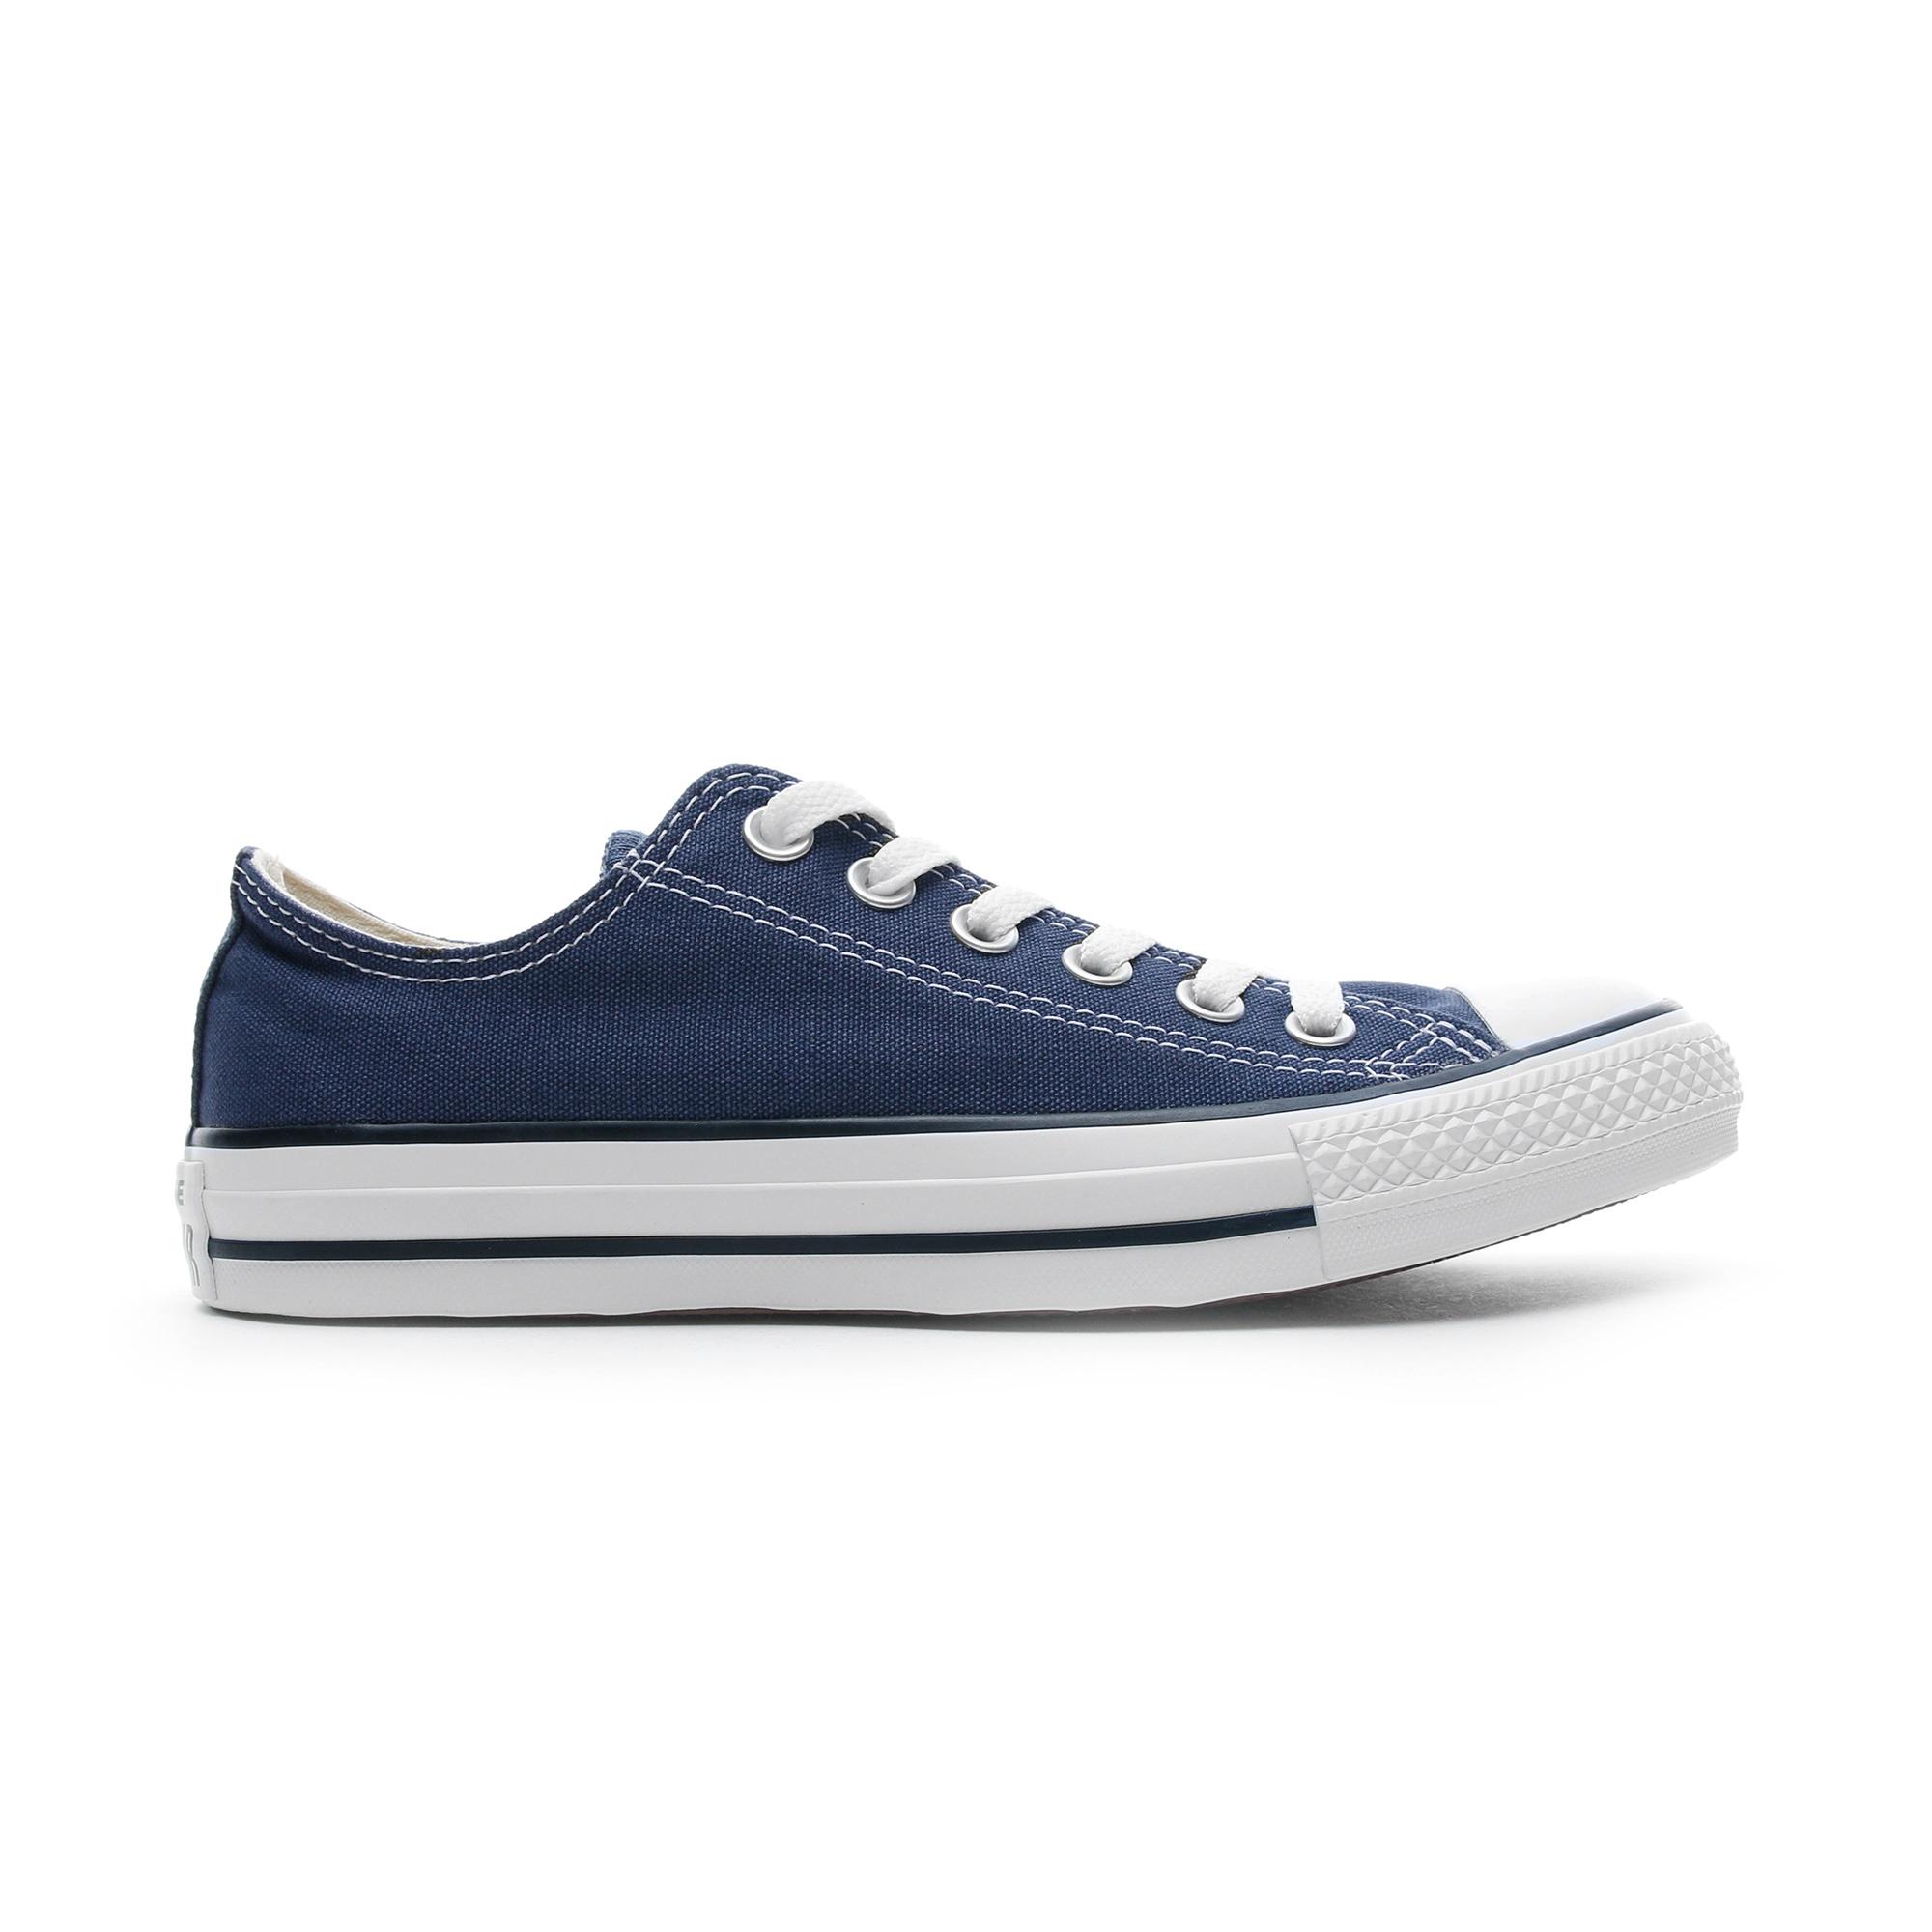 Converse Chuck Taylor All Star Unisex Lacivert Sneaker